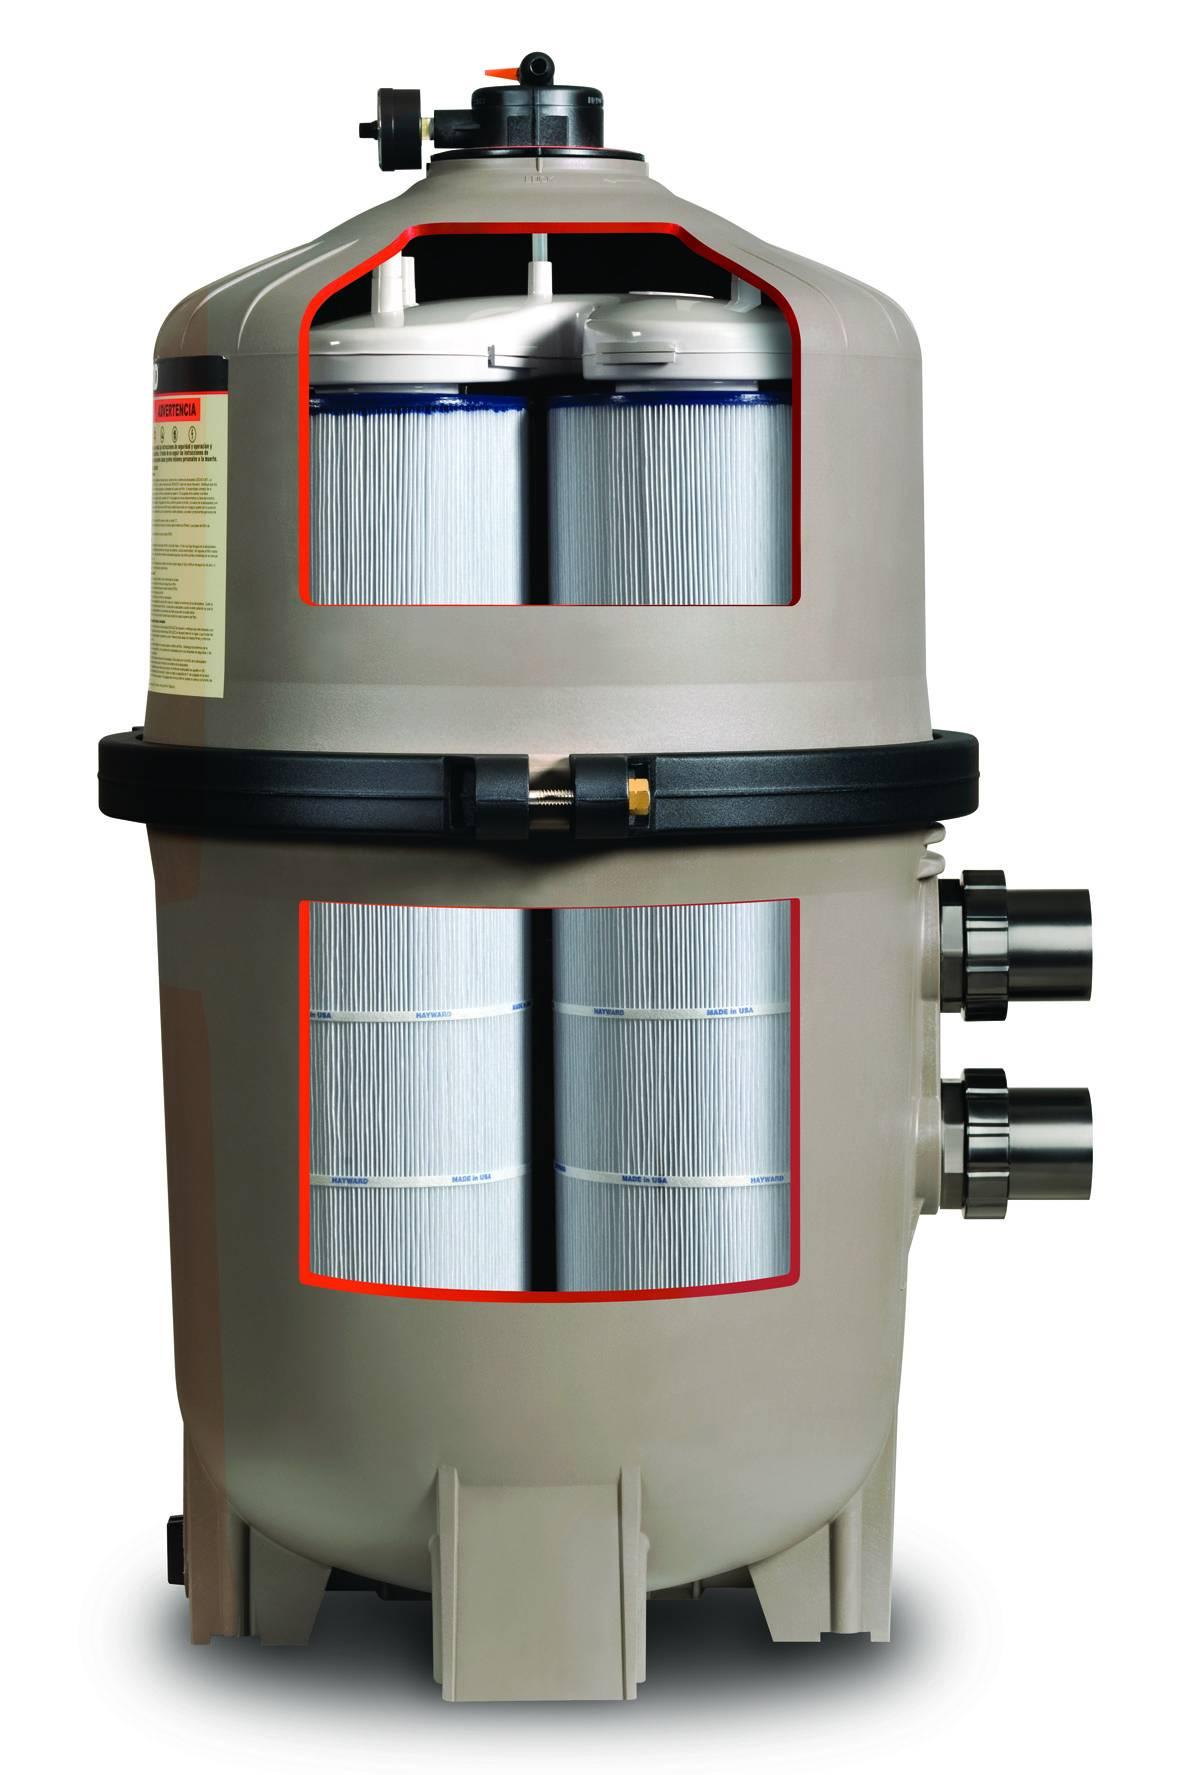 Filtre a cartouches pour piscine hayward swimclear multi - Cartouche filtre piscine magiline ...